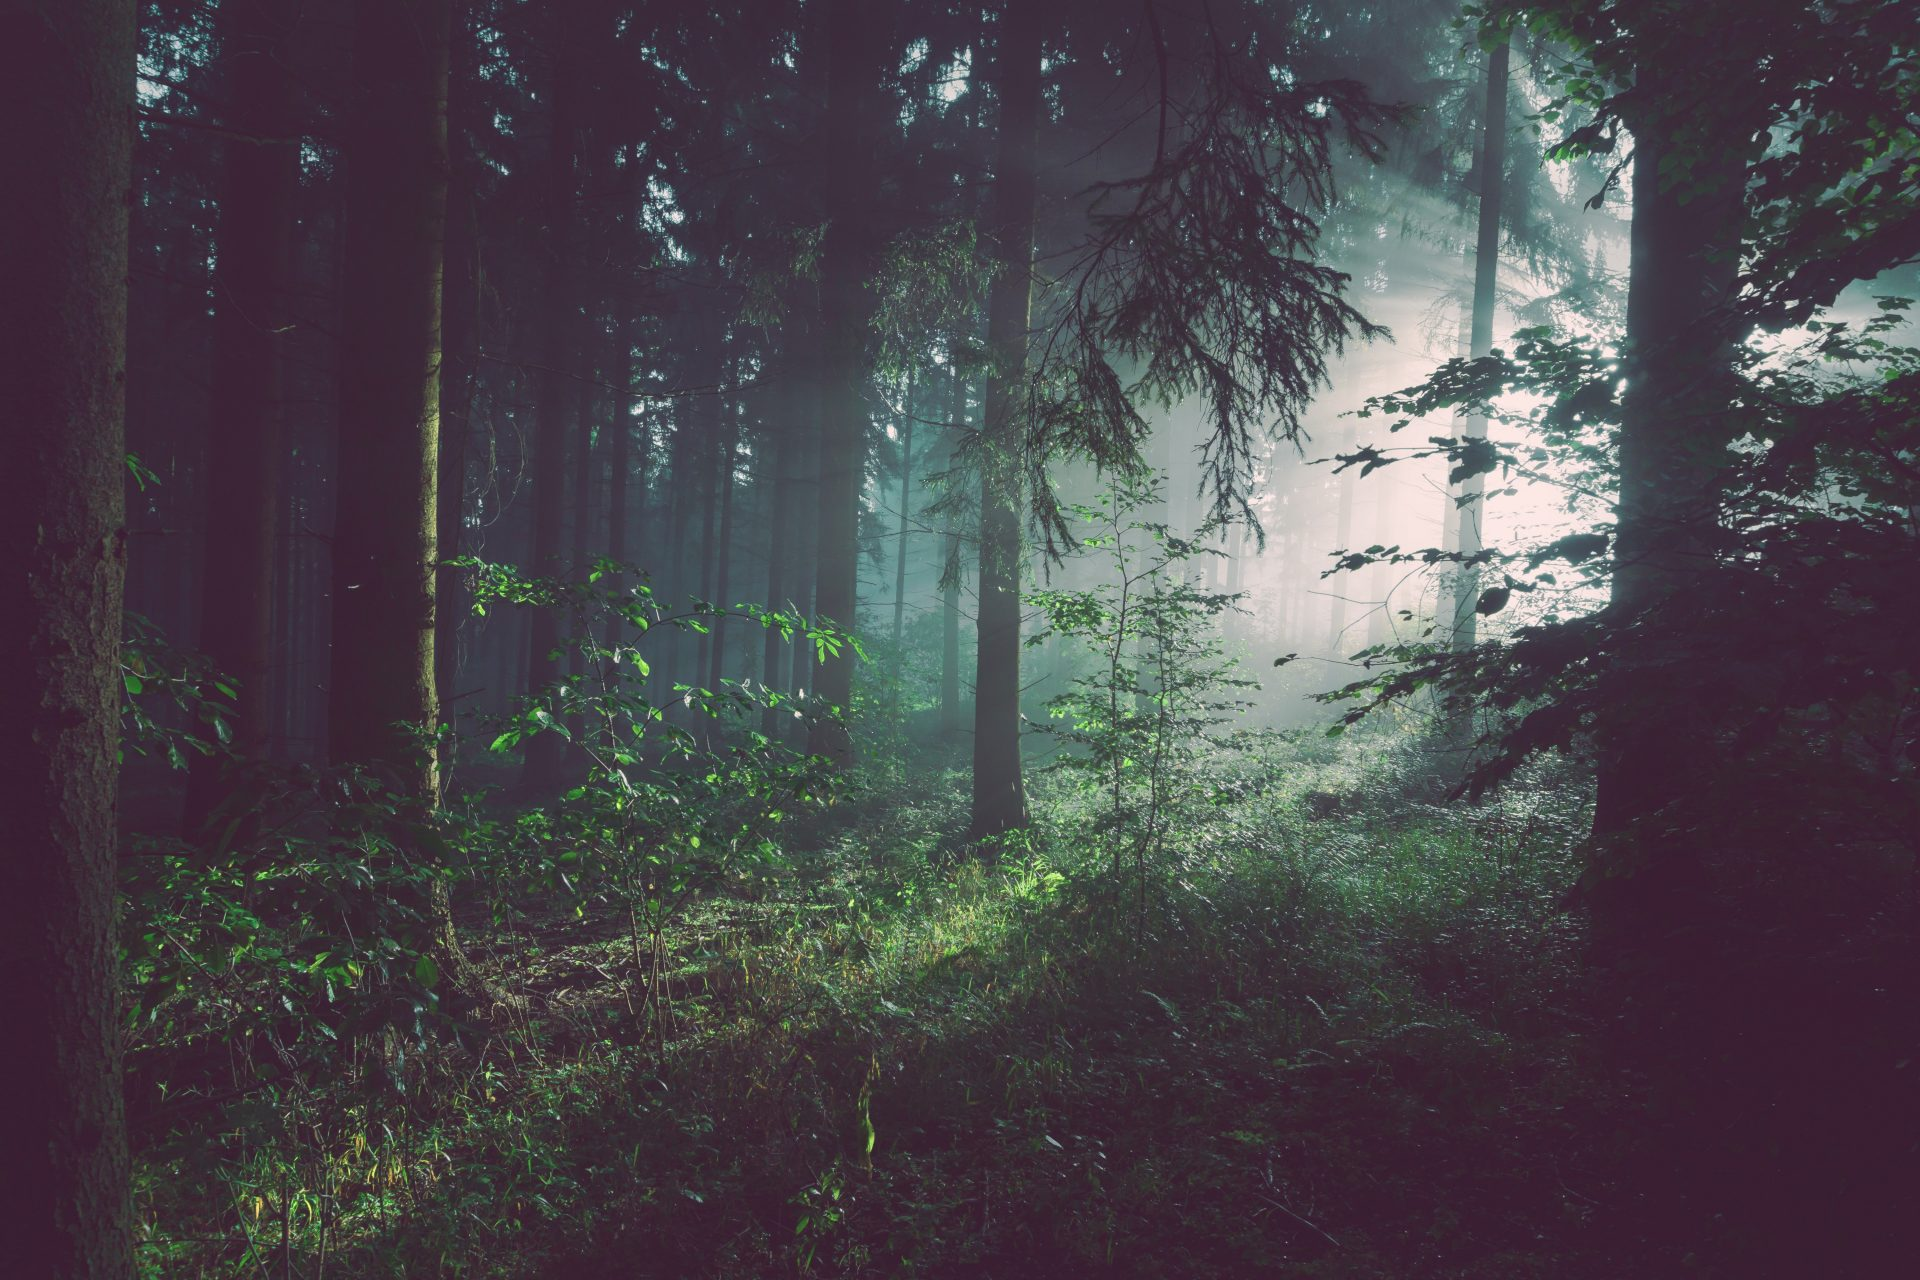 les-ekologia-flora-fauna-stromy-cisty-vzduch-oddych-priroda-machy